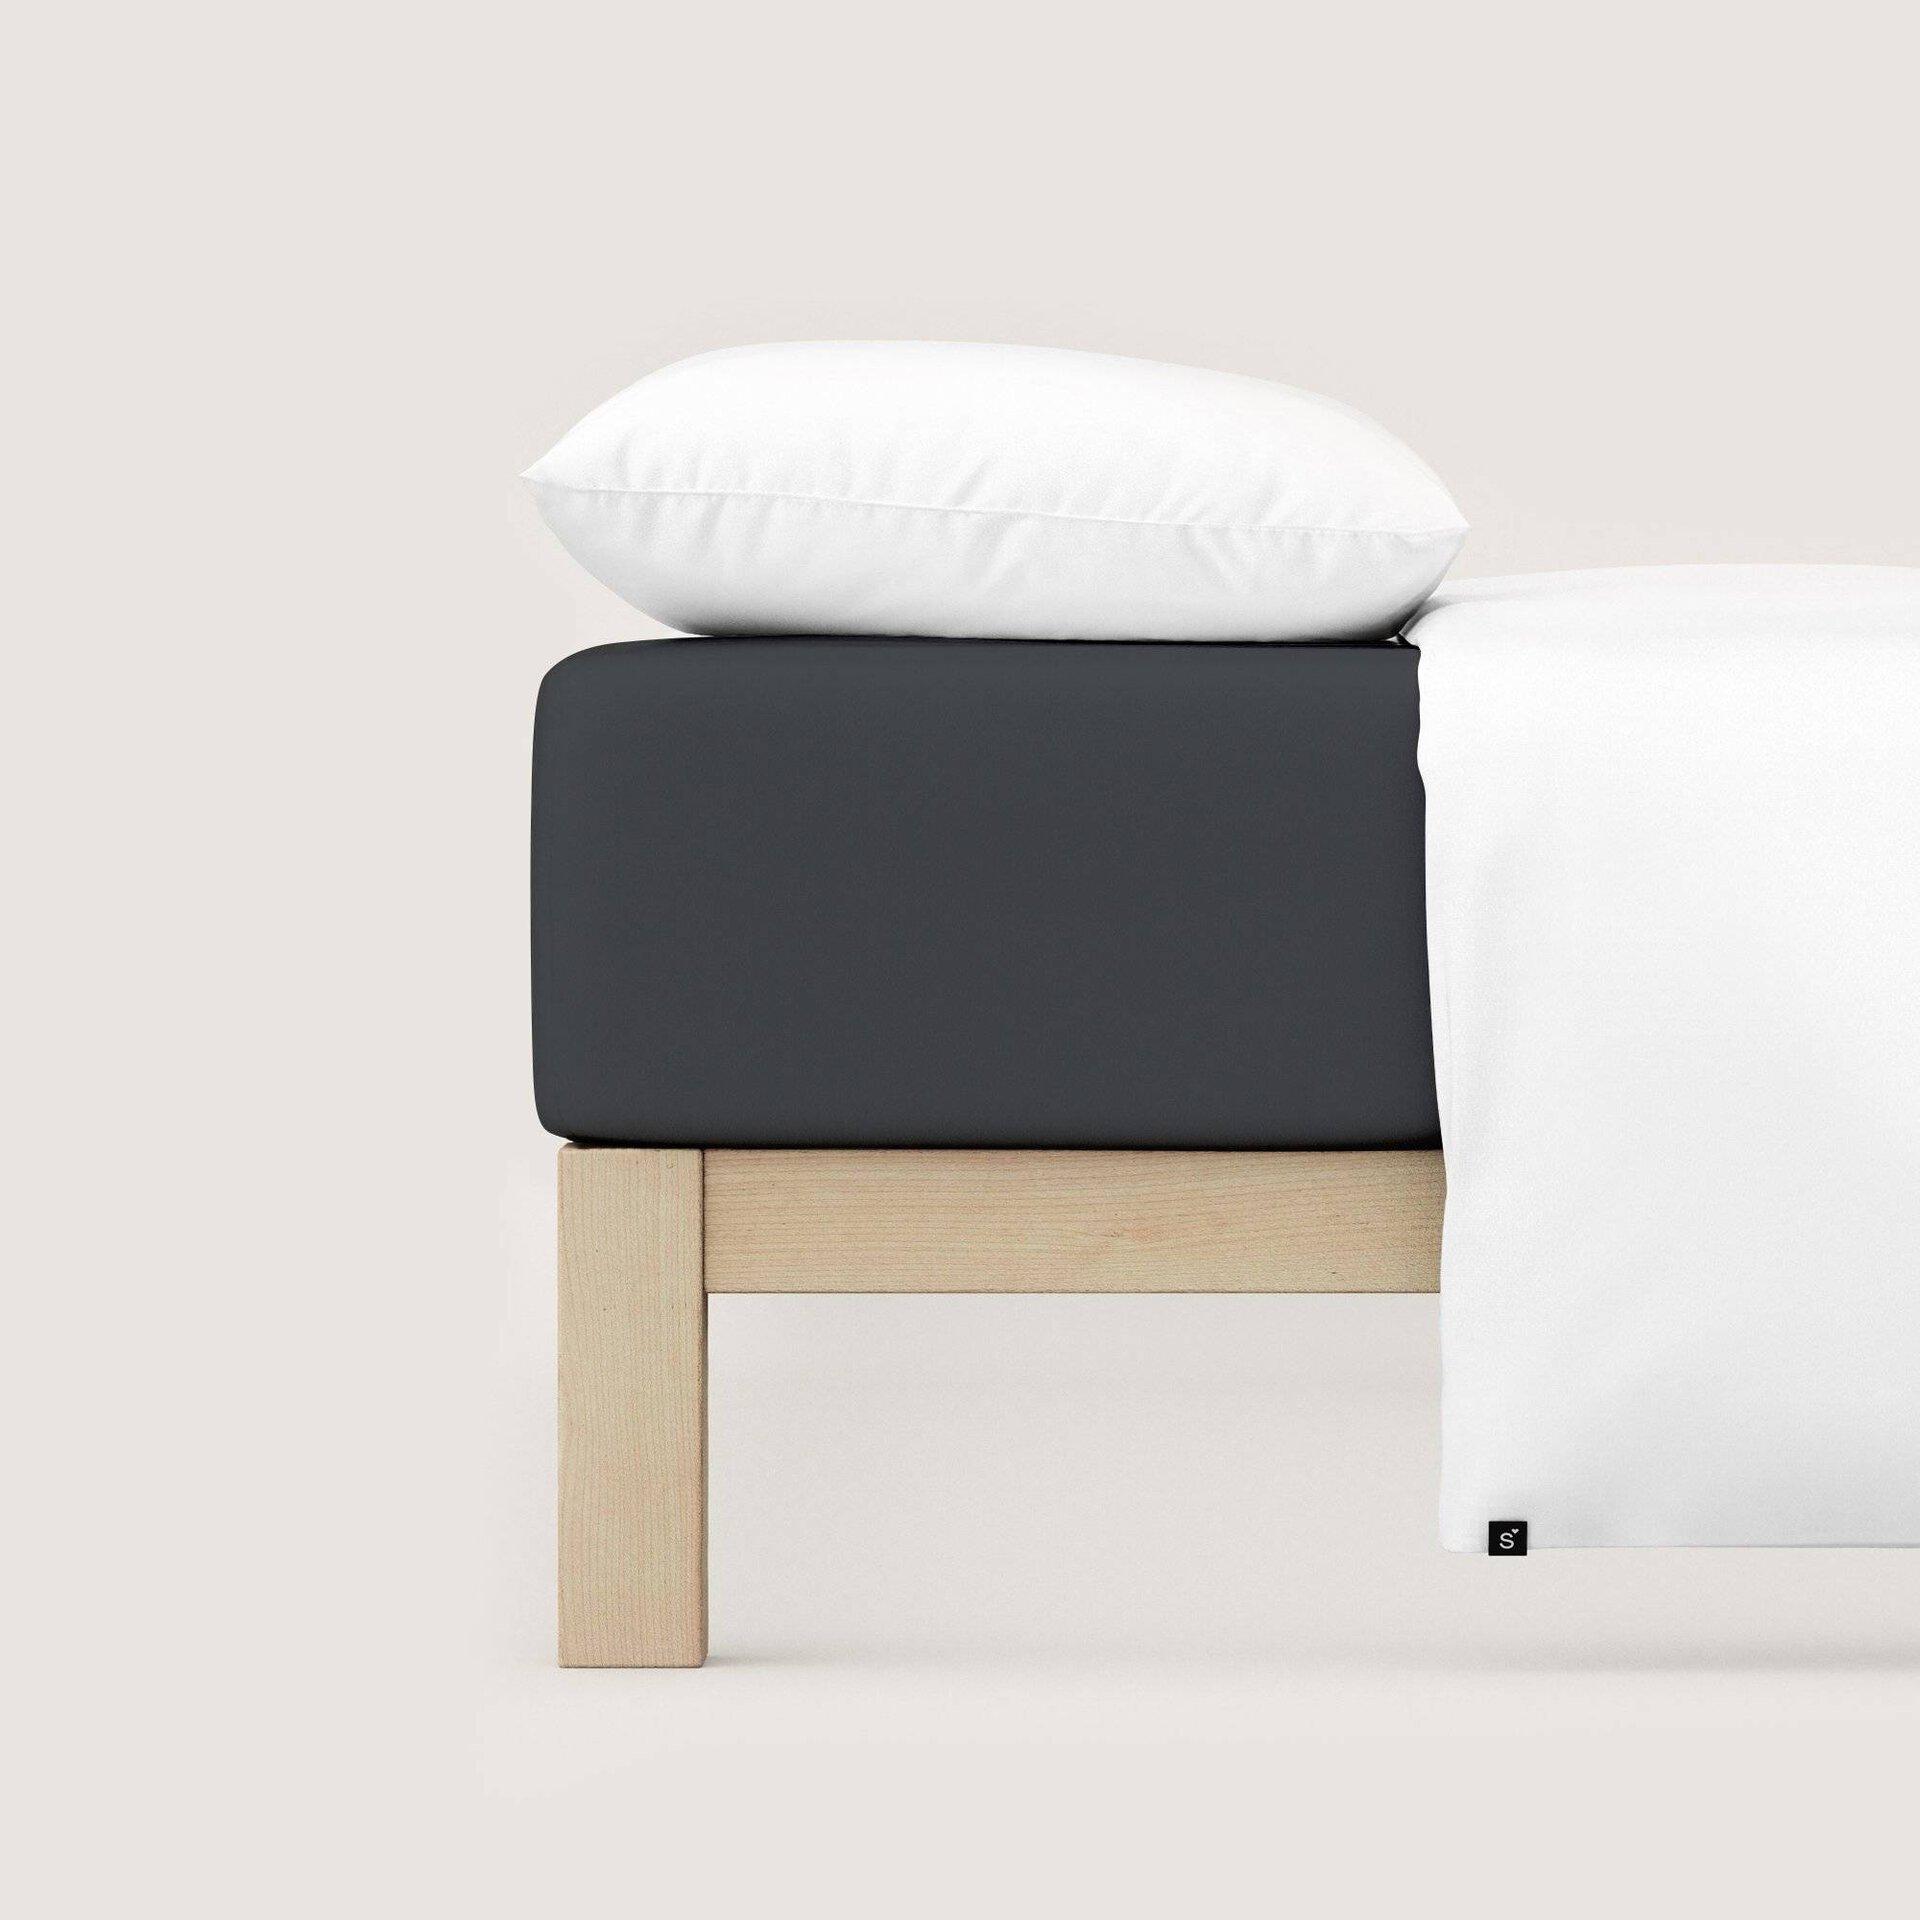 Jersey-Spannbetttuch Schlafgut Textil grau 150 x 200 cm